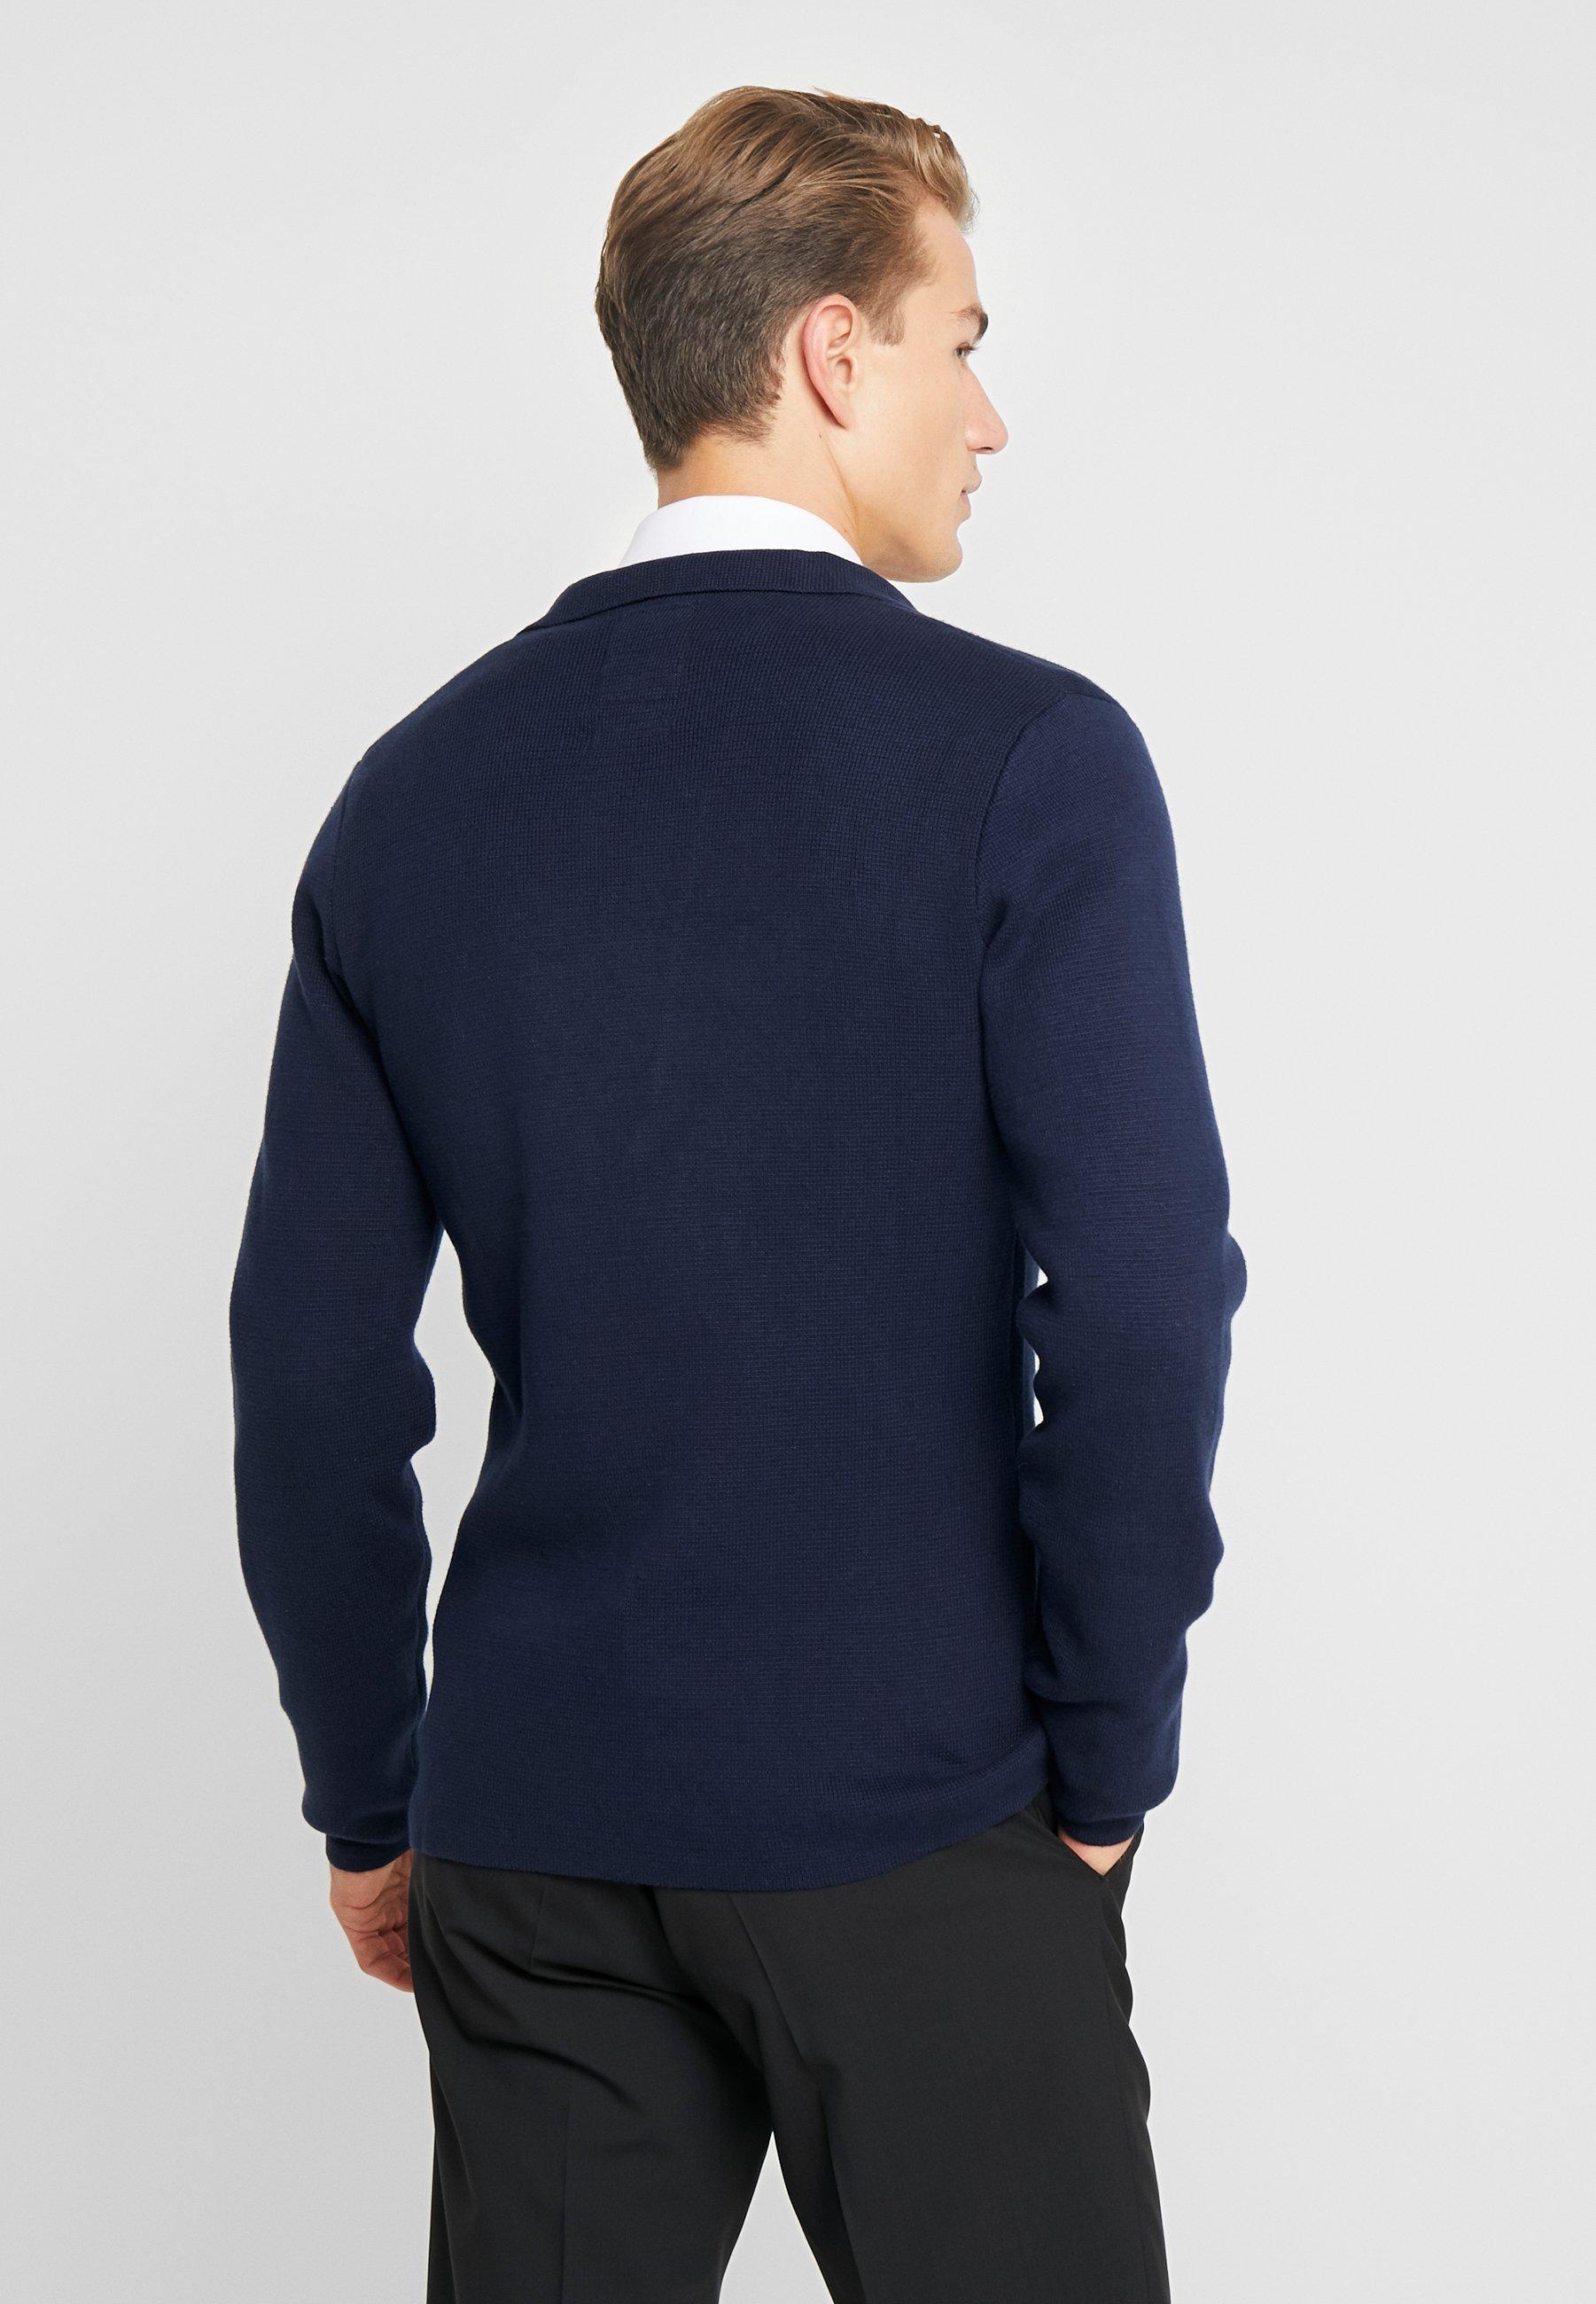 Outlet Limit Discount Men's Clothing Casual Friday BLAZER Blazer jacket night navy e86lZIAd6 Yzo118Jnj